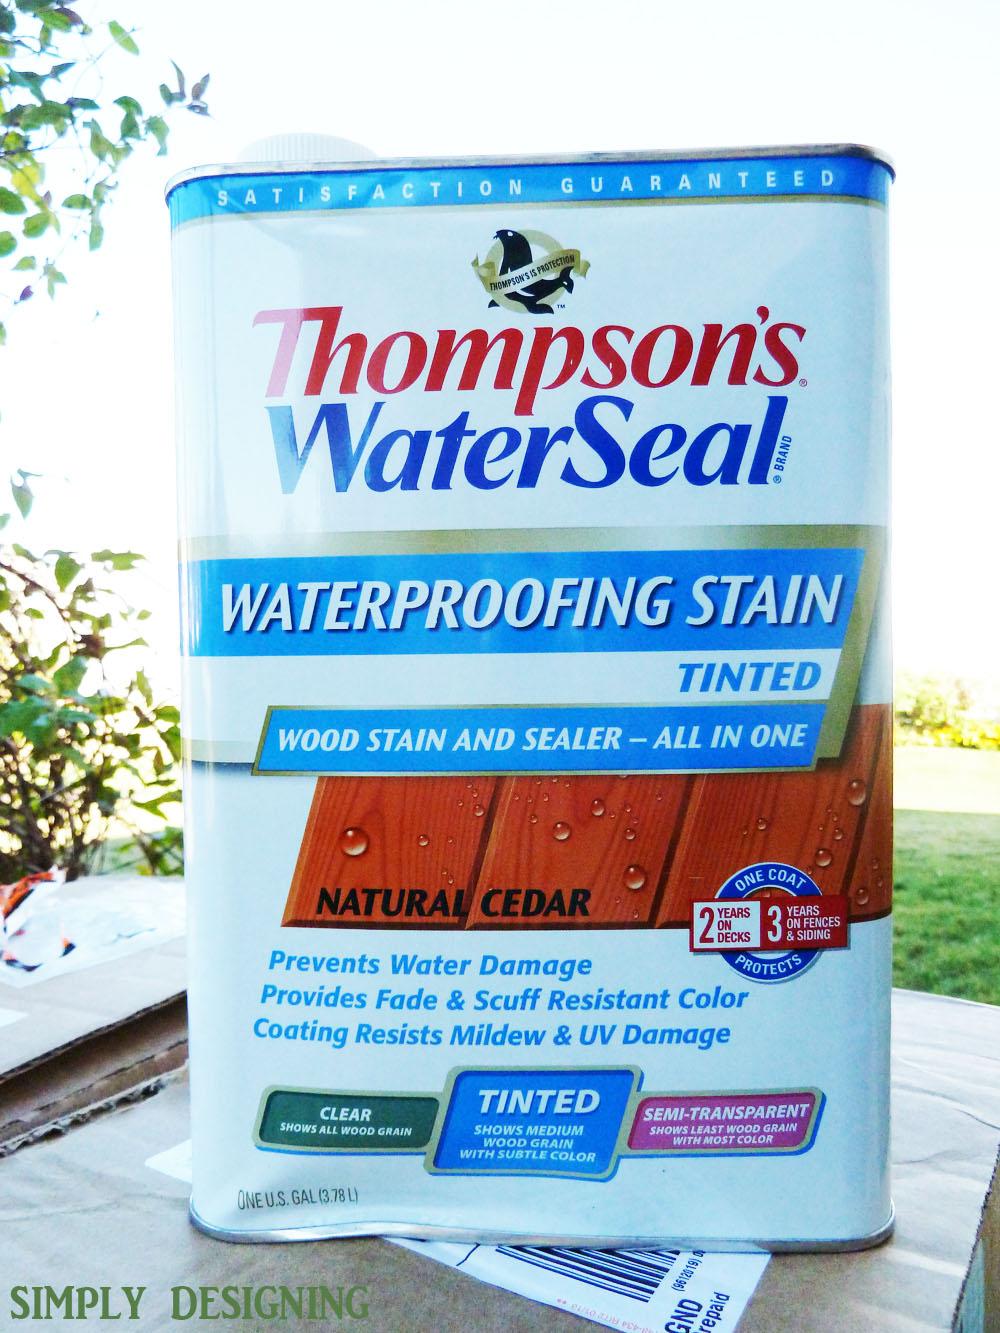 Deck Sprayer For Waterless Car Wash